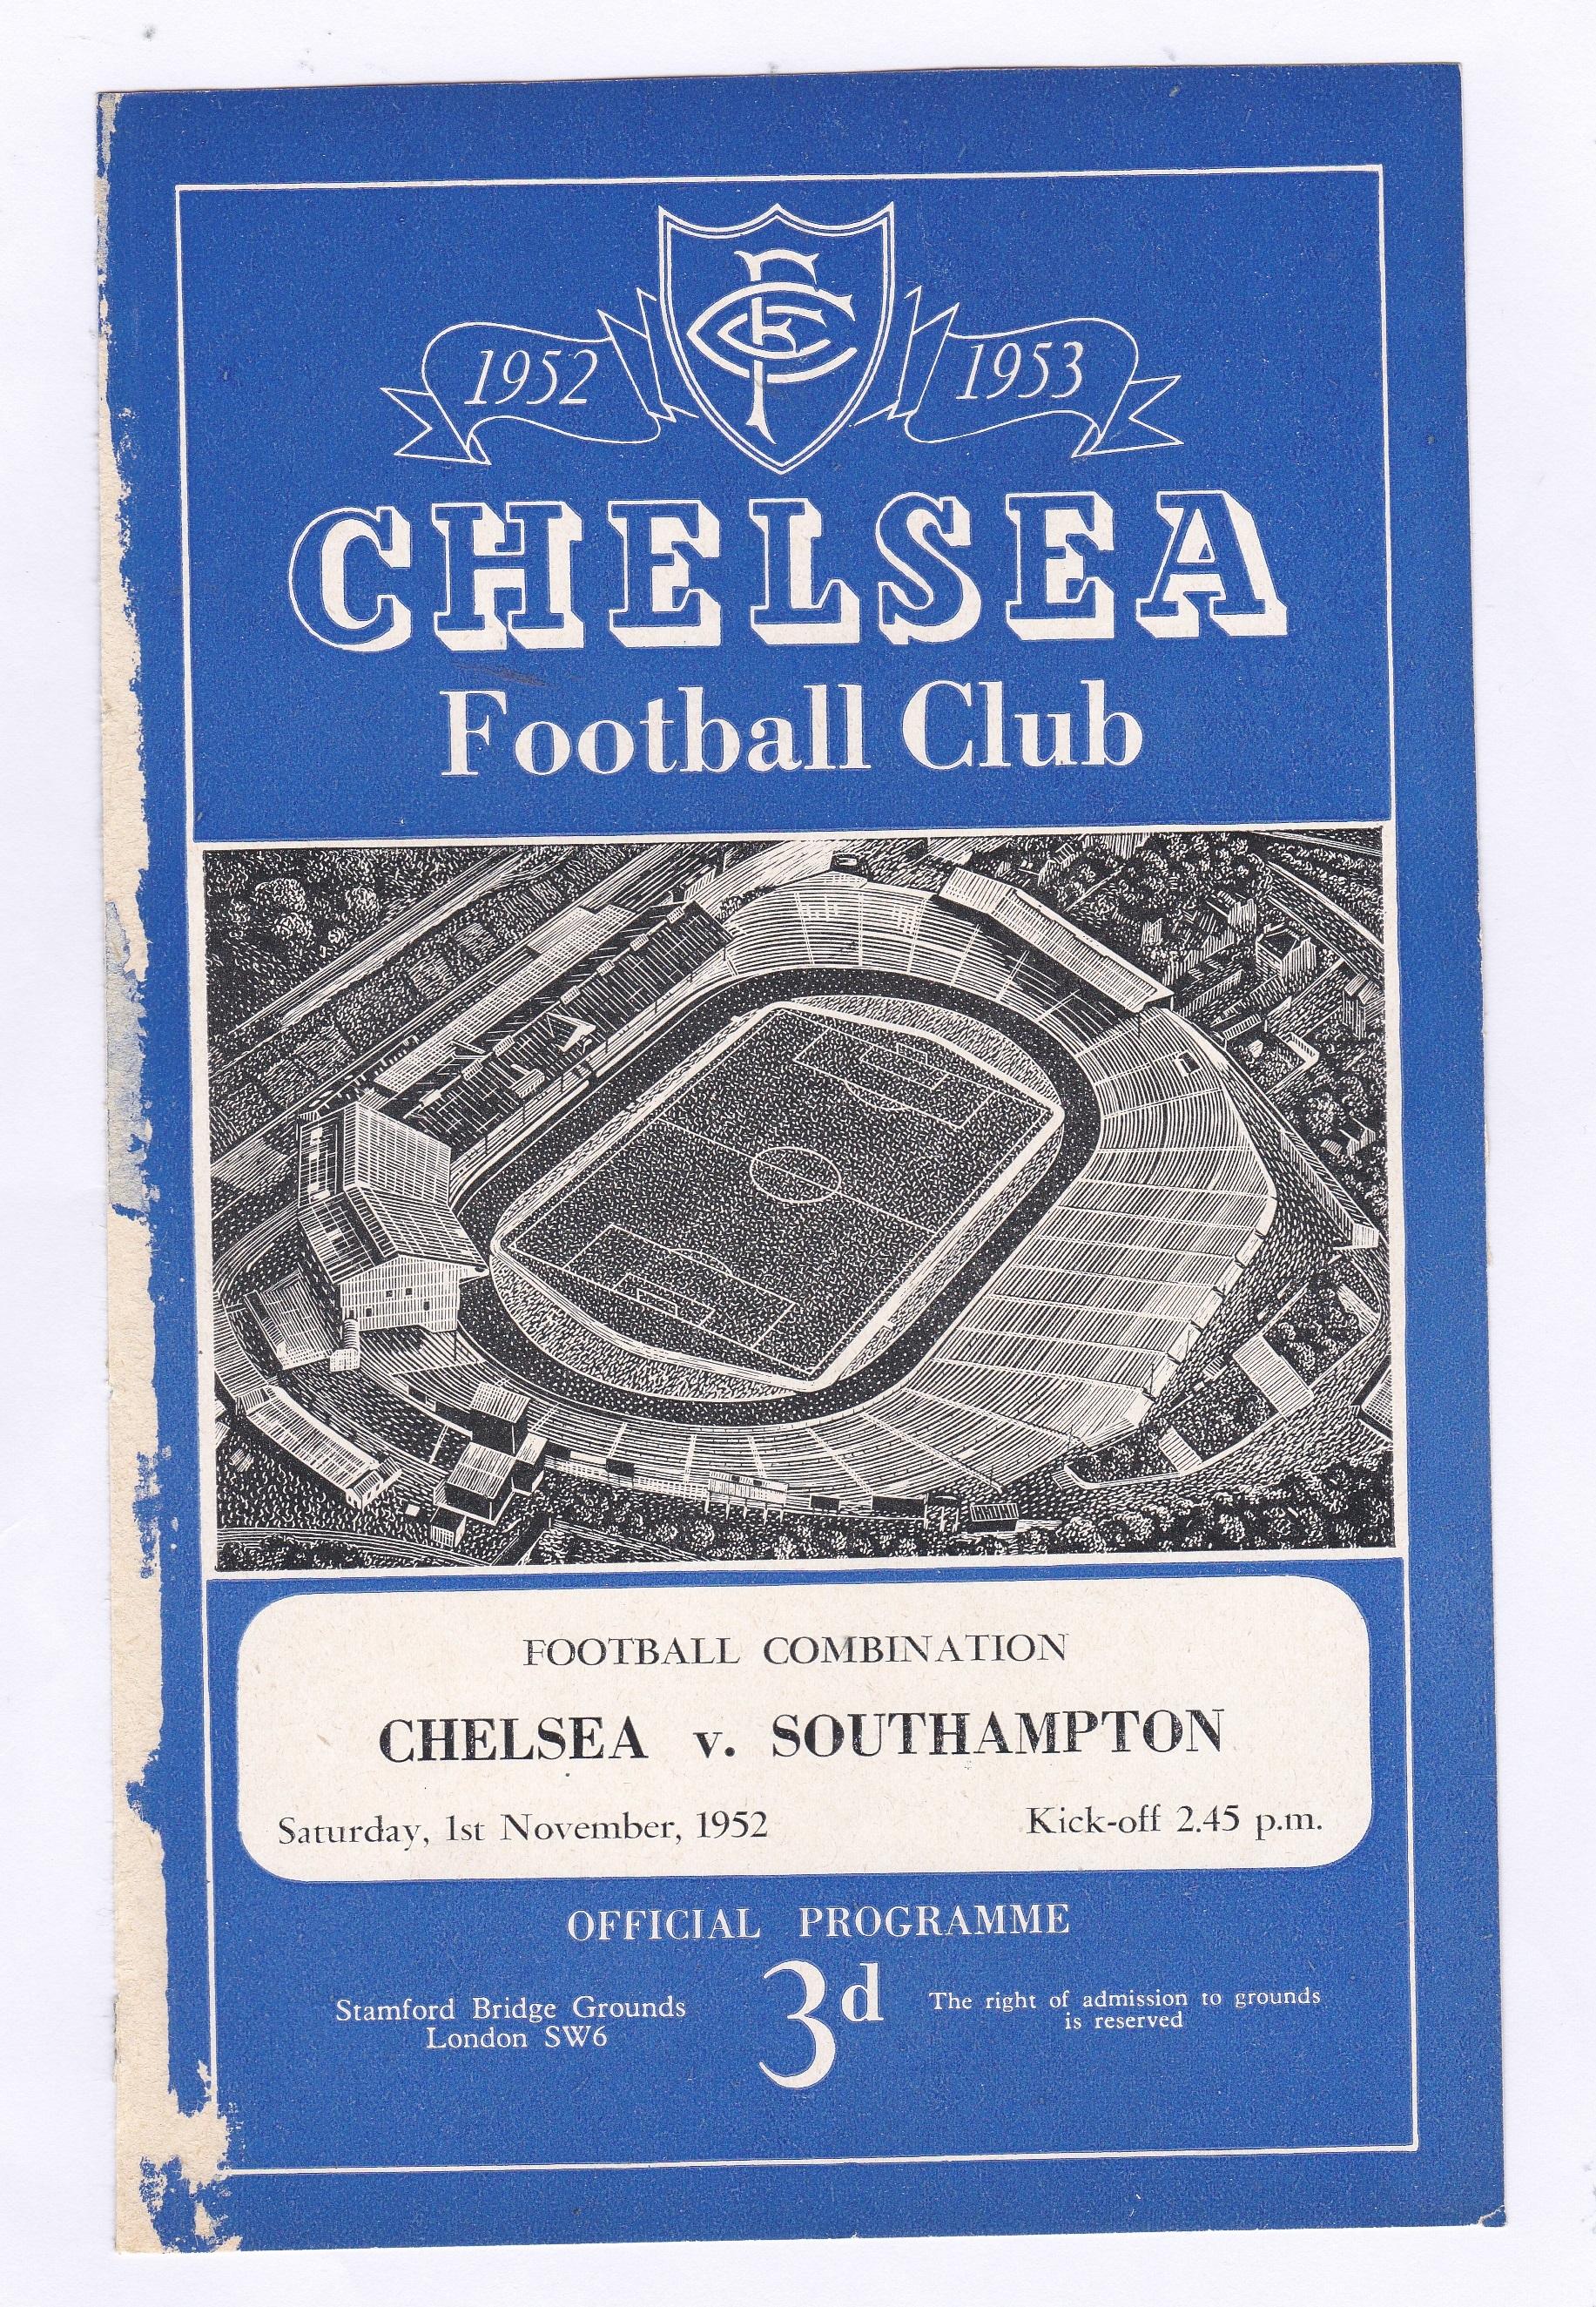 Chelsea v Southampton 1952 1st November Football Combination cover wear left side